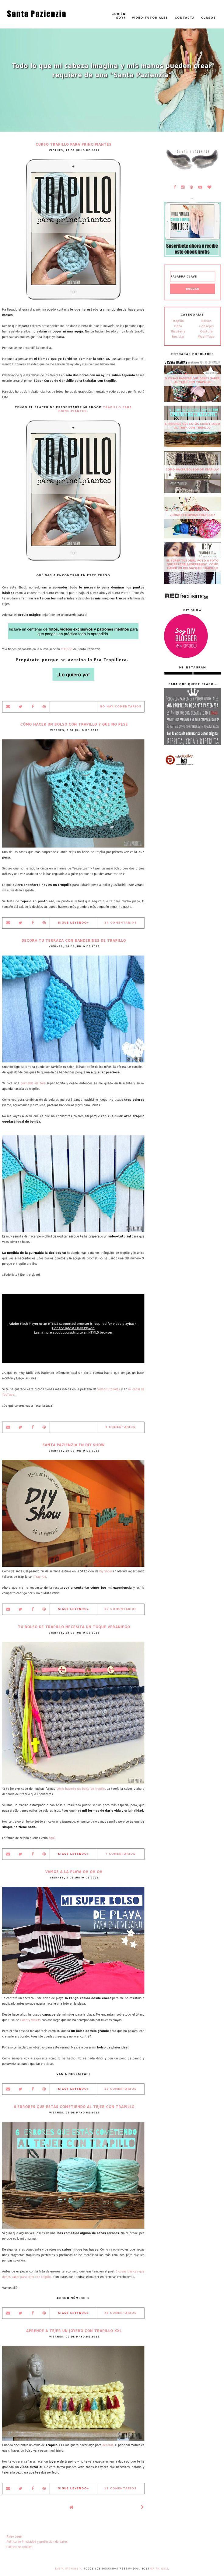 The 25 best ganchillo images on Pinterest   Crocheted bags ...